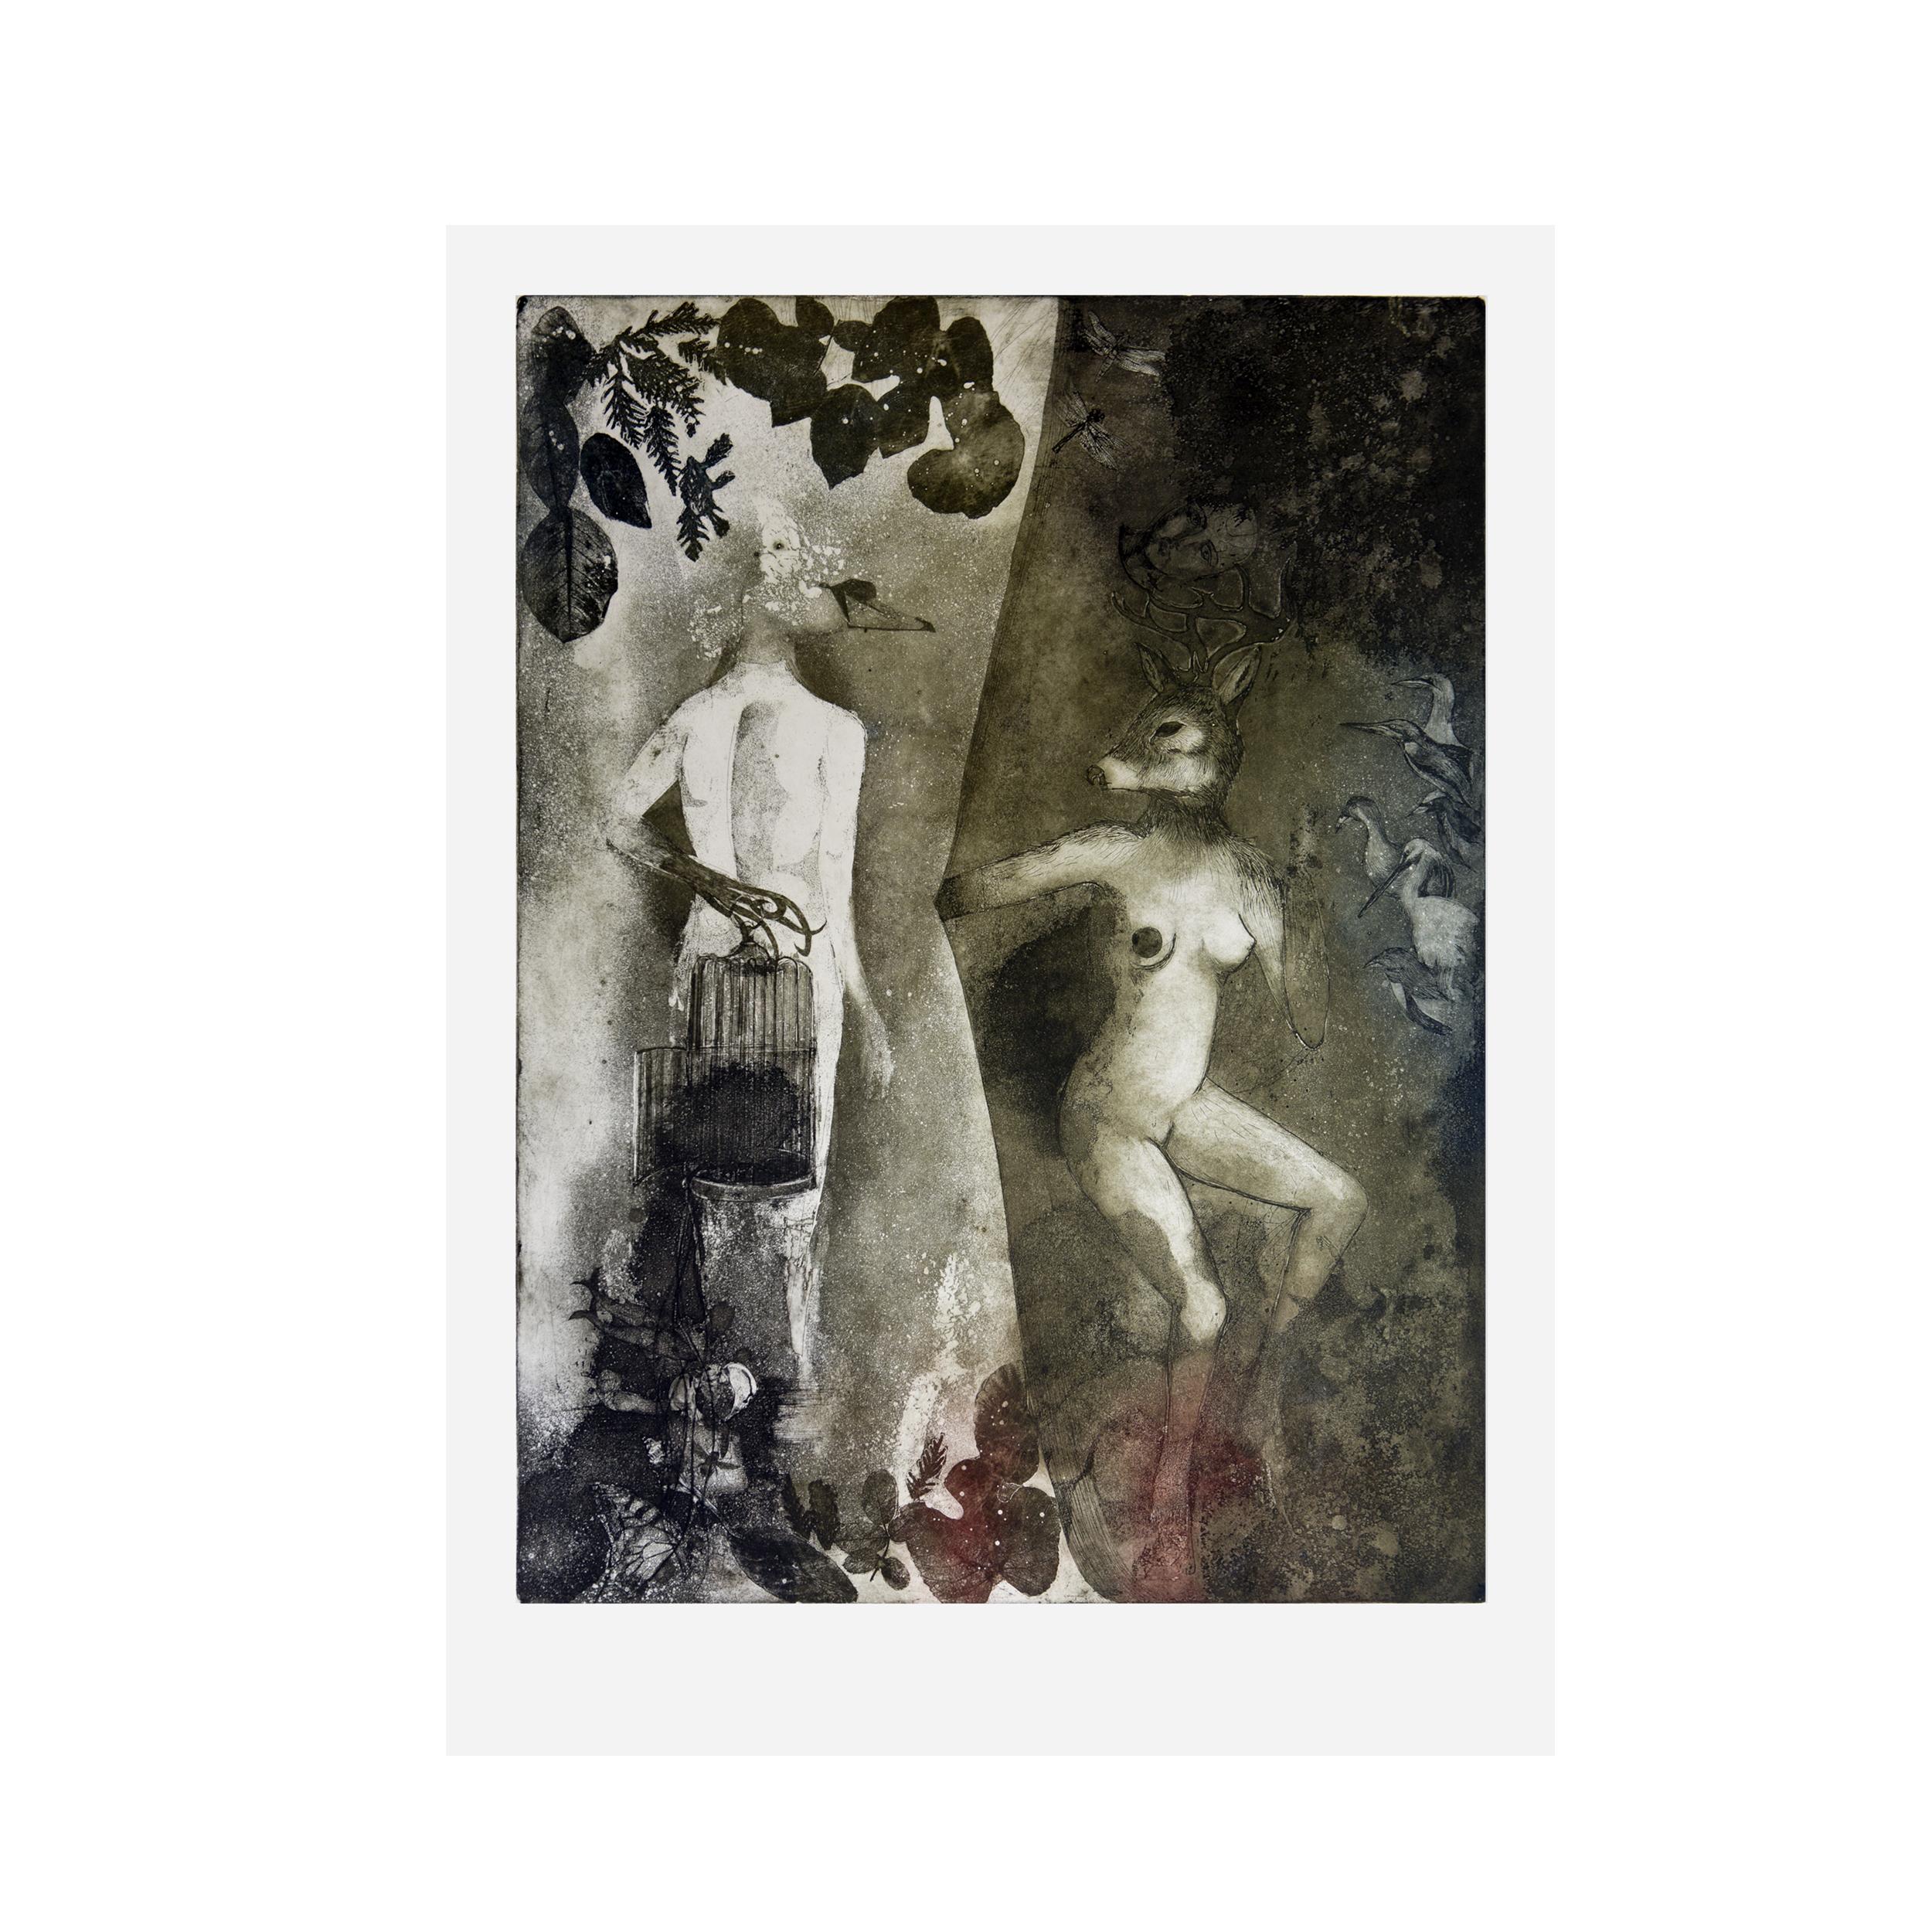 """Nigredo - The Dark Side of Eden"" aquatint, eau forte, vernis mou, dry point 50 x 70 cm , 2010"